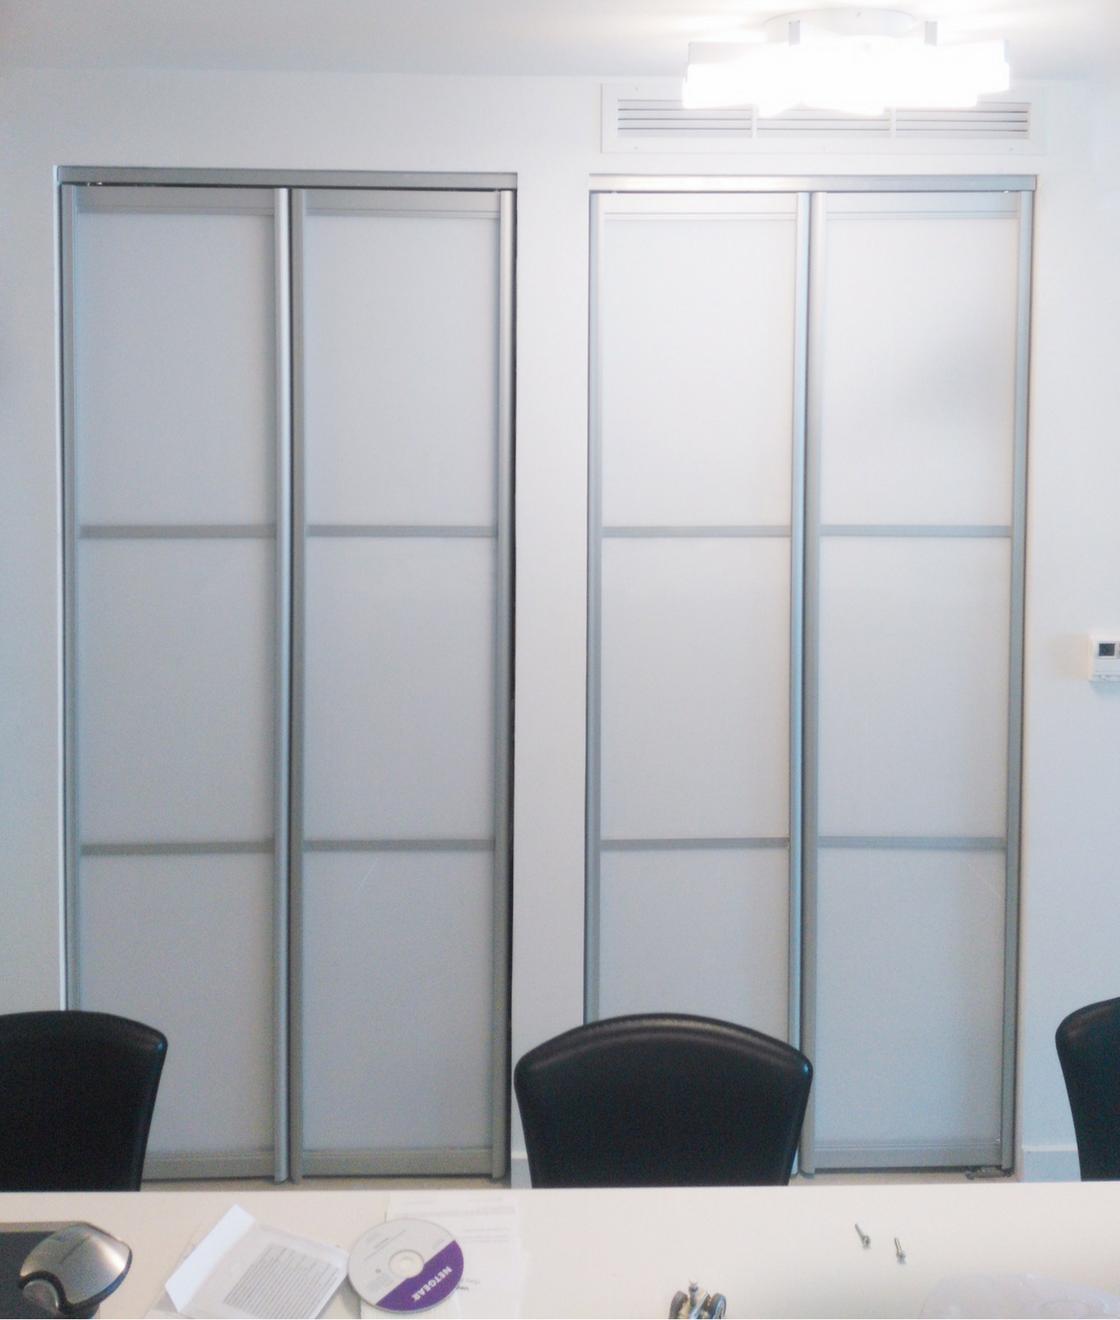 Custom Bifold Closet Doors Snow White Glass Panels And Aluminum